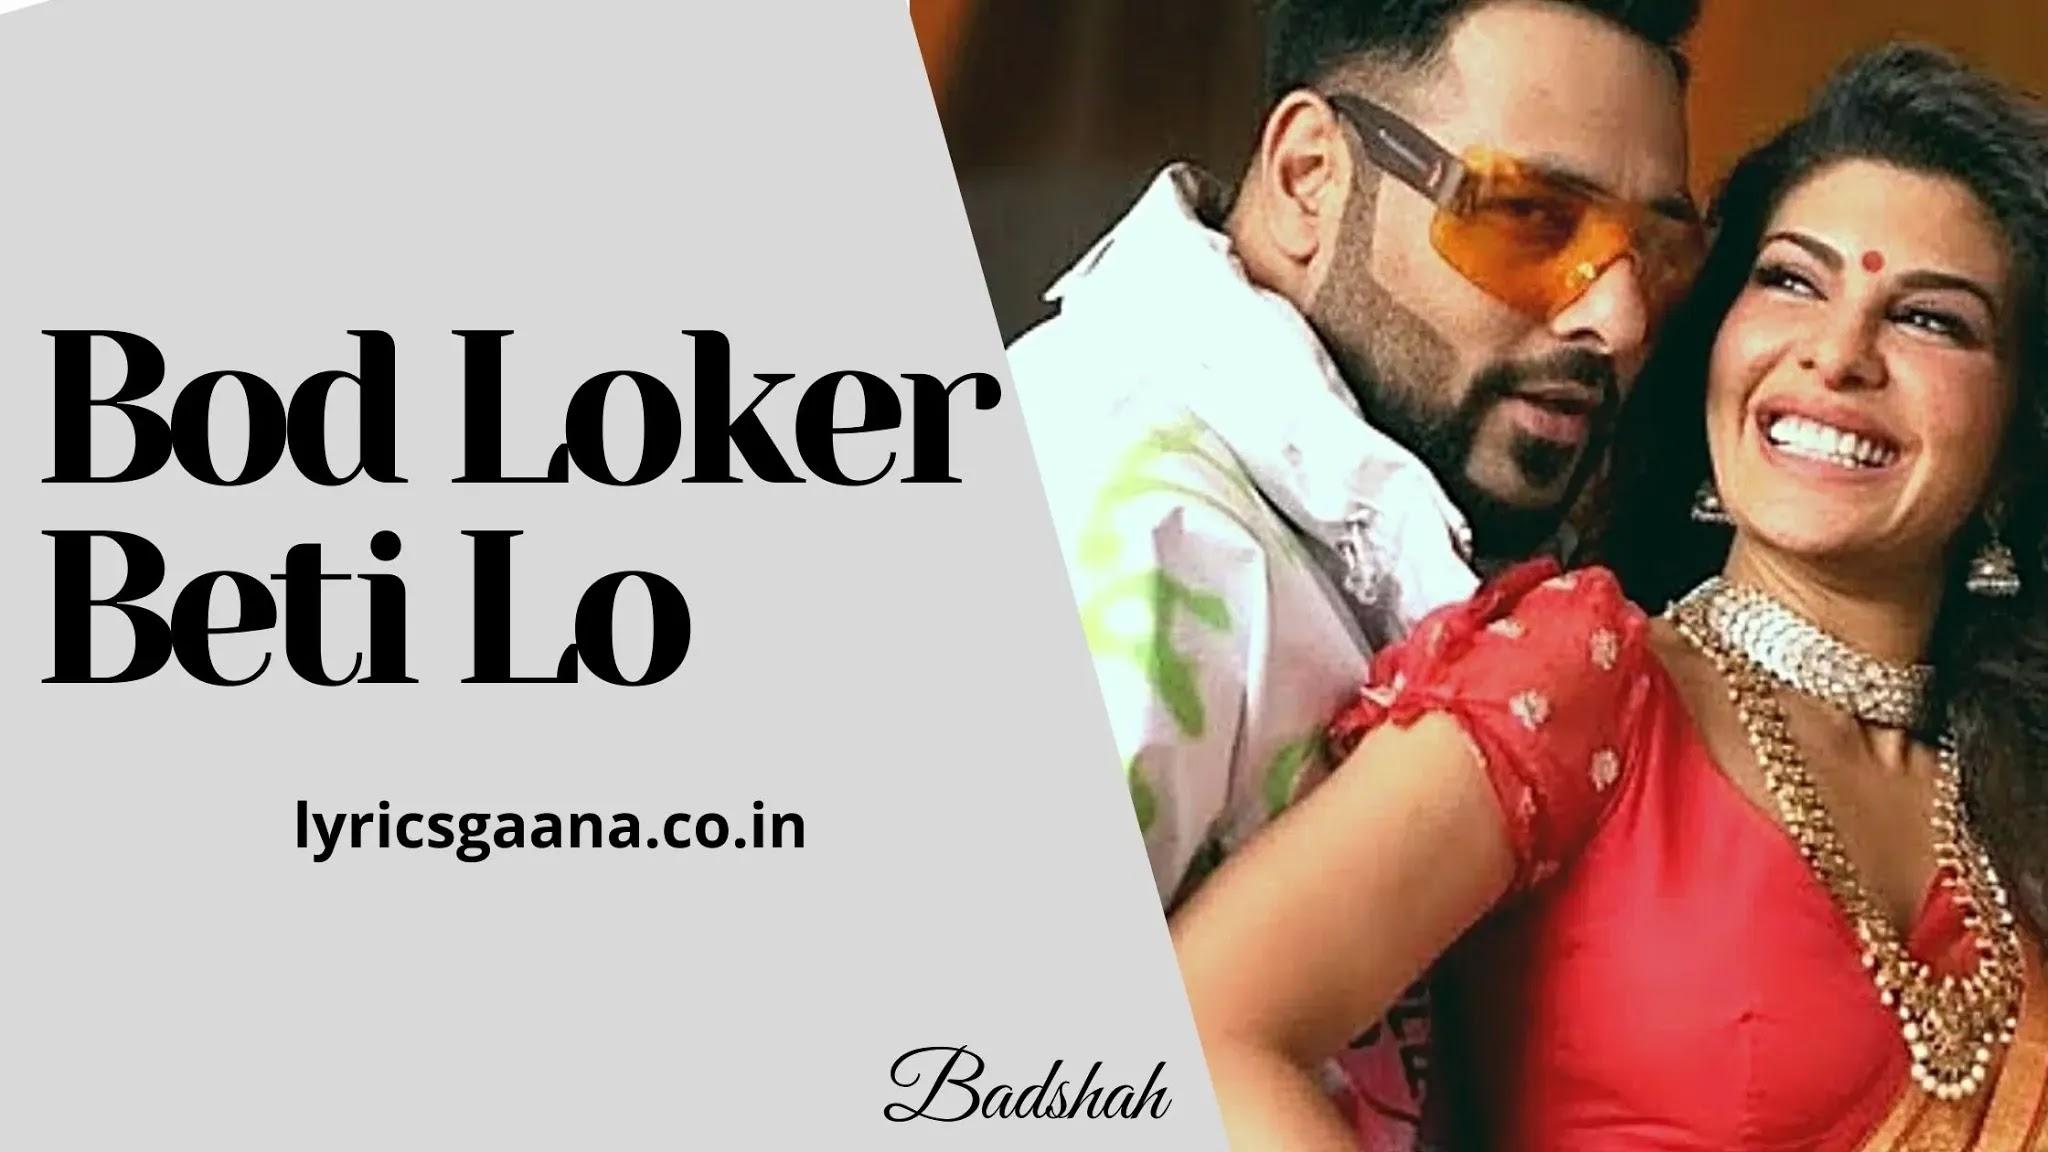 Bod Loker Beti Lo Lyrics In Hindi | Panjabi Song गेंदा फूल Lyrics